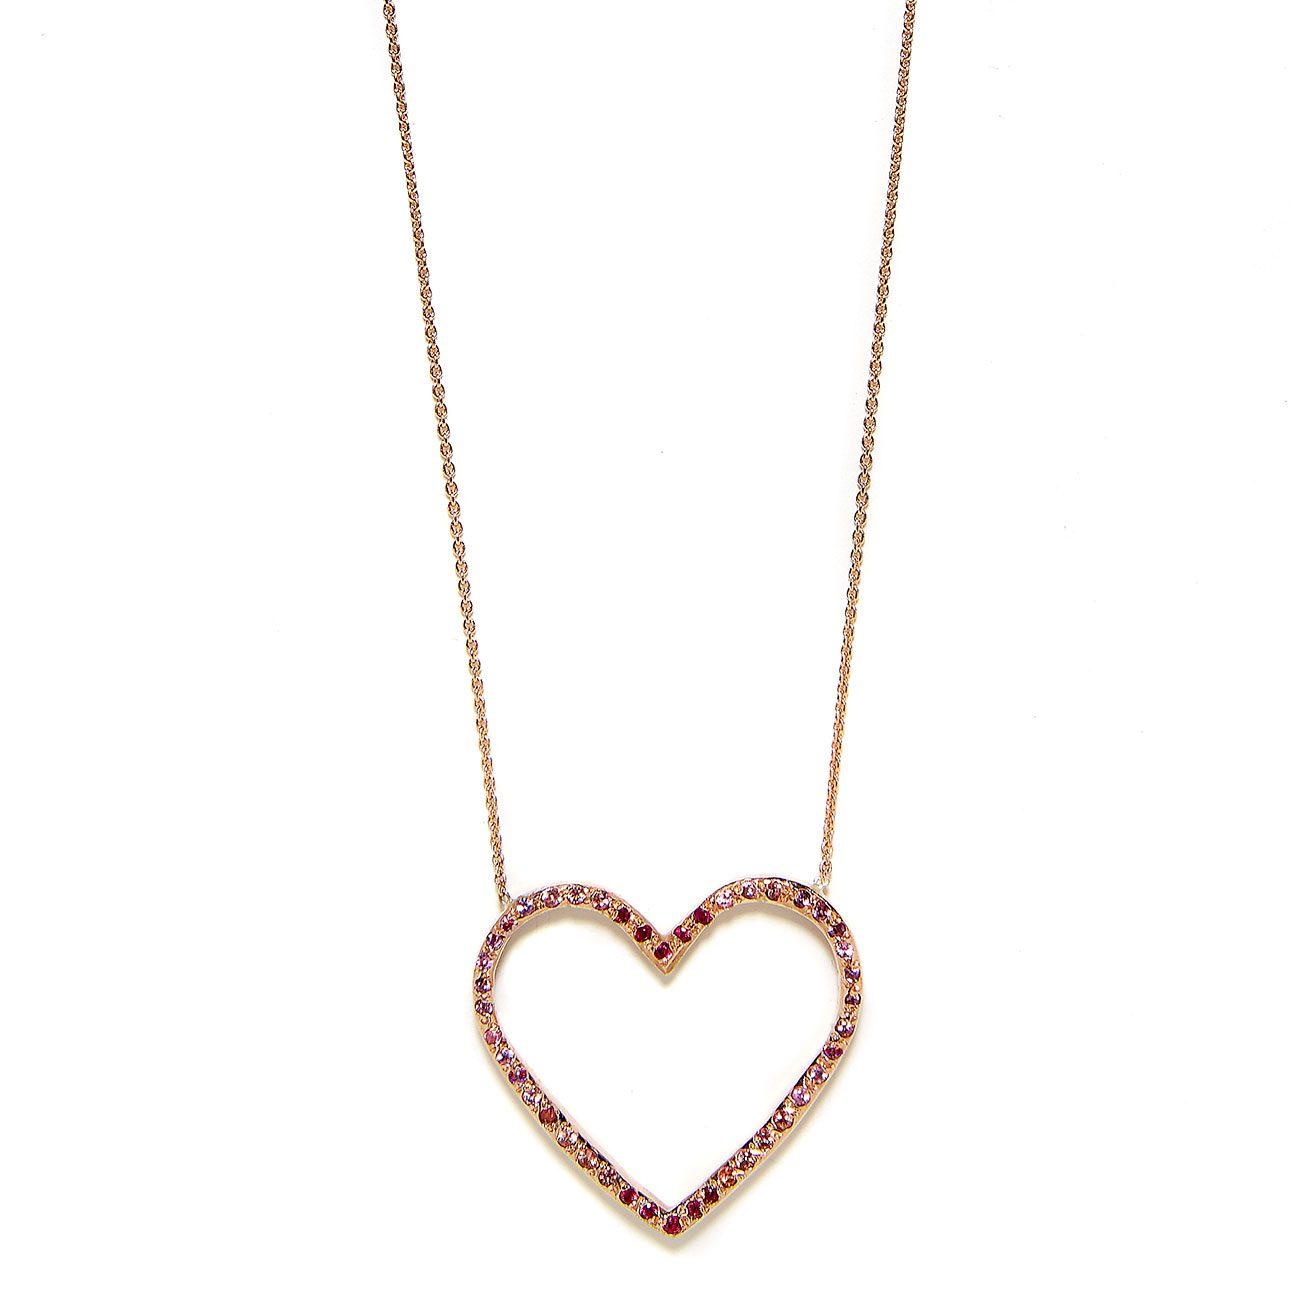 Pink ombre open heart necklace elisa solomon jewelry pink gold ombre large open heart necklace mozeypictures Choice Image